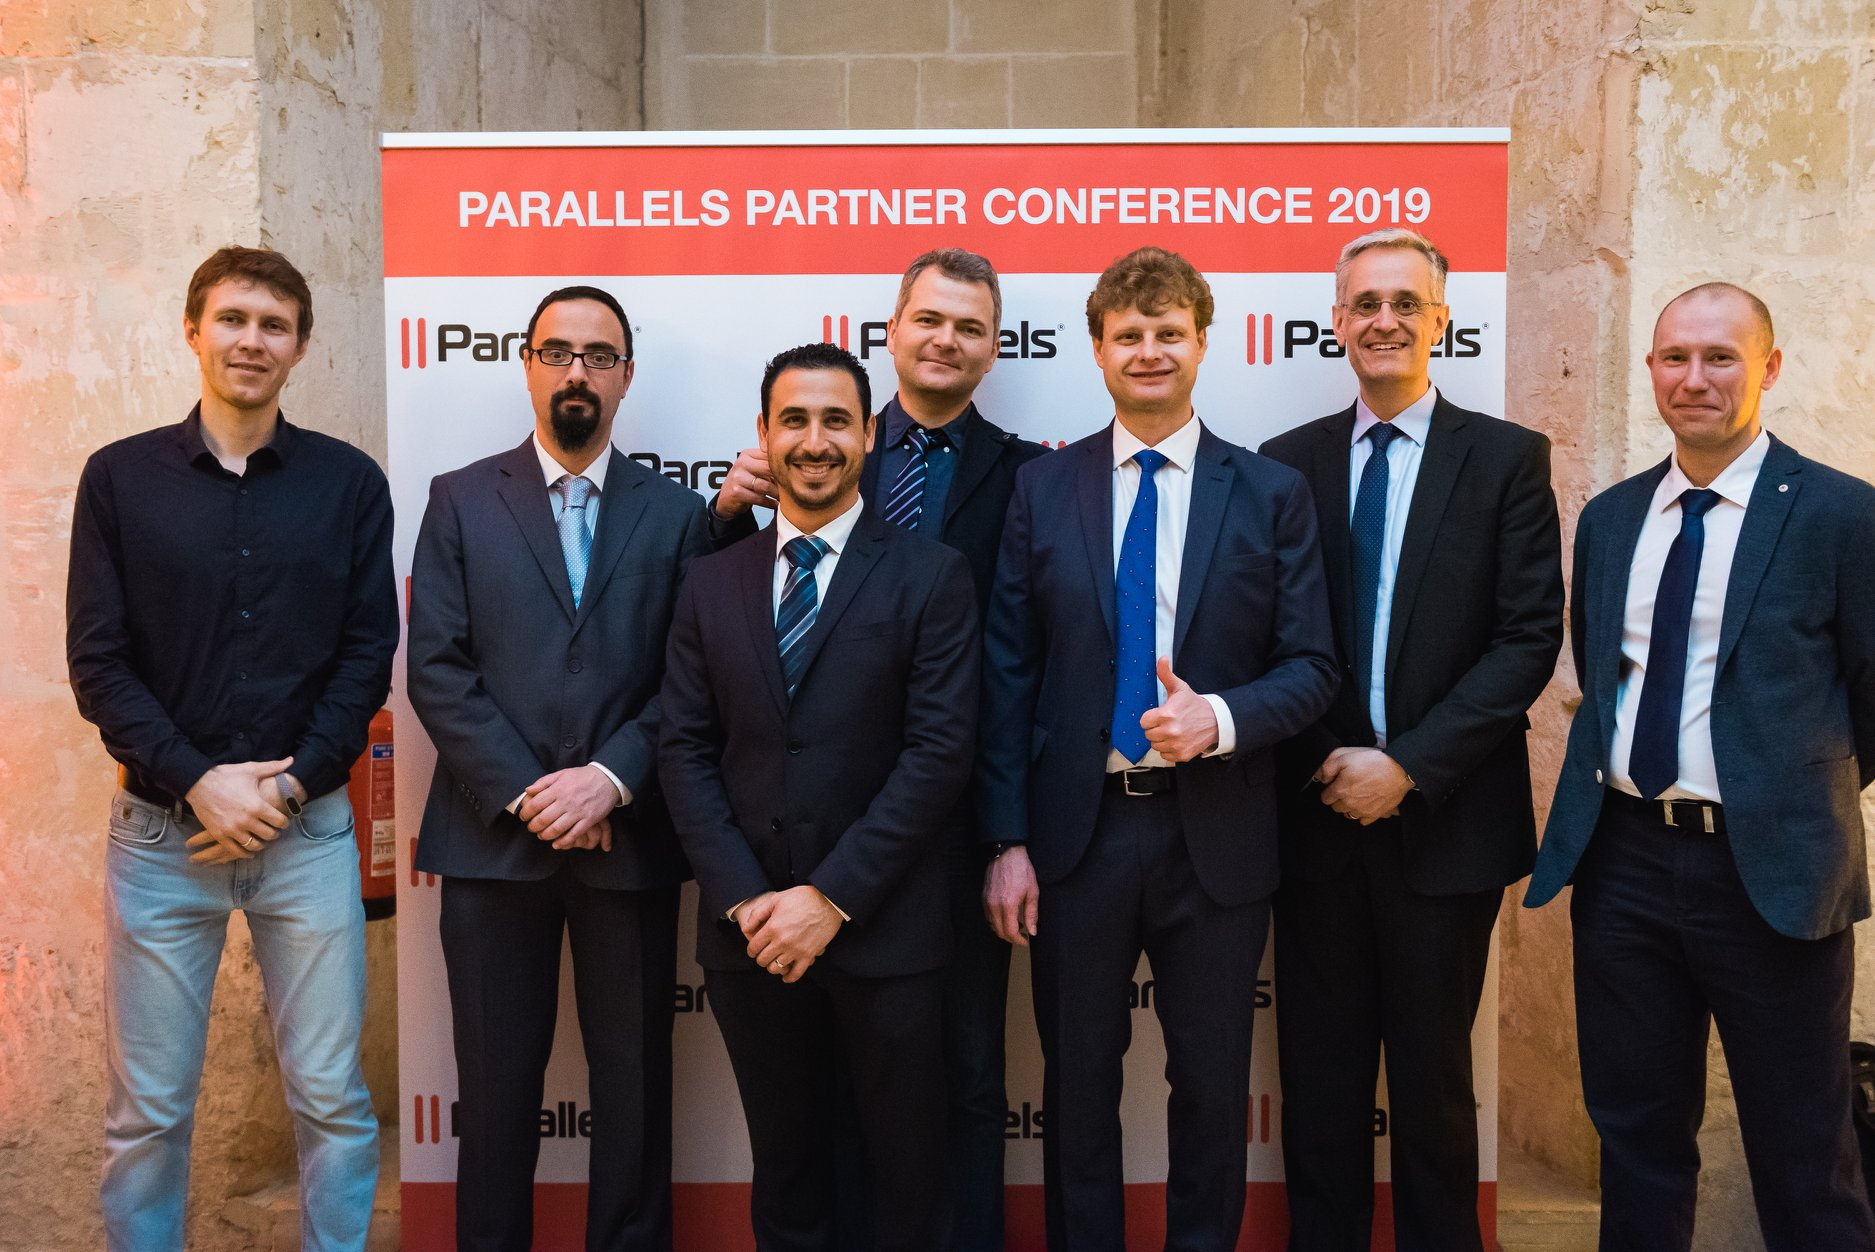 Parallels Partner Conference